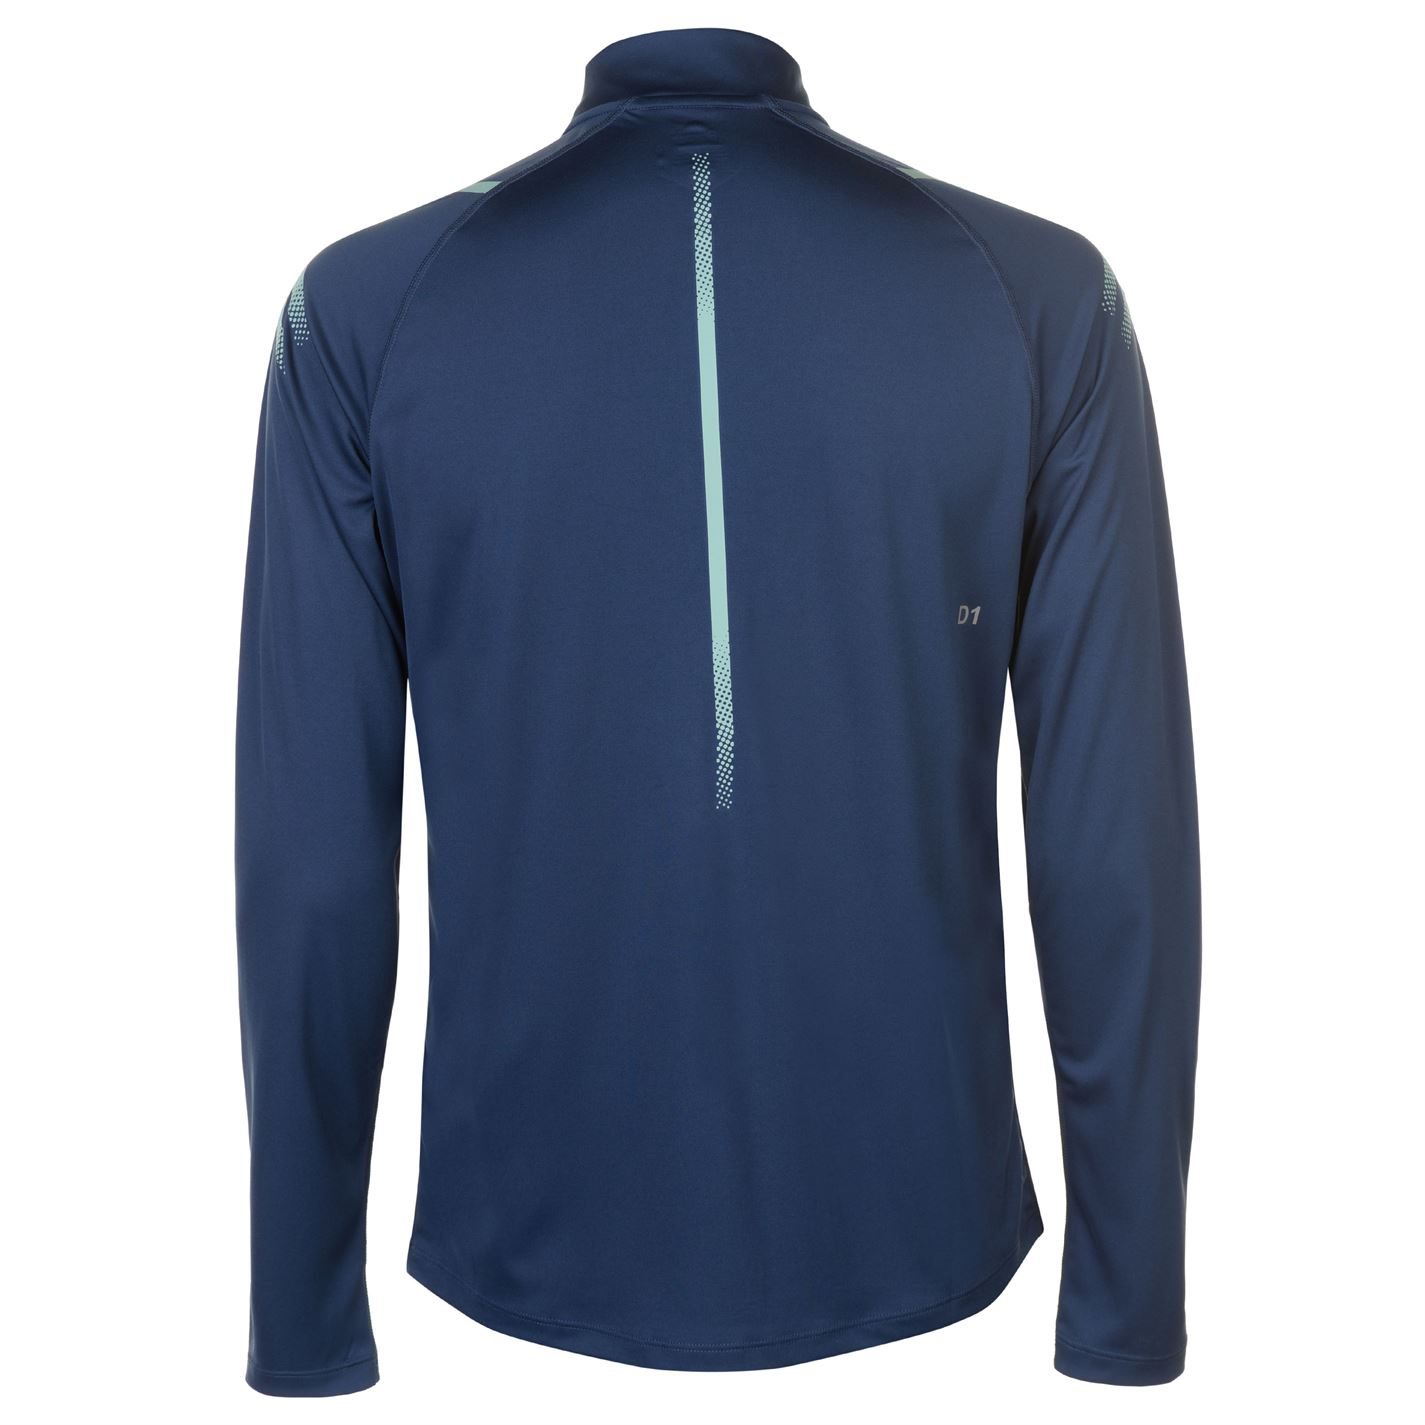 c41346128845 Asics Icon Half Zip Top Long Sleeve Performance Shirt Mens